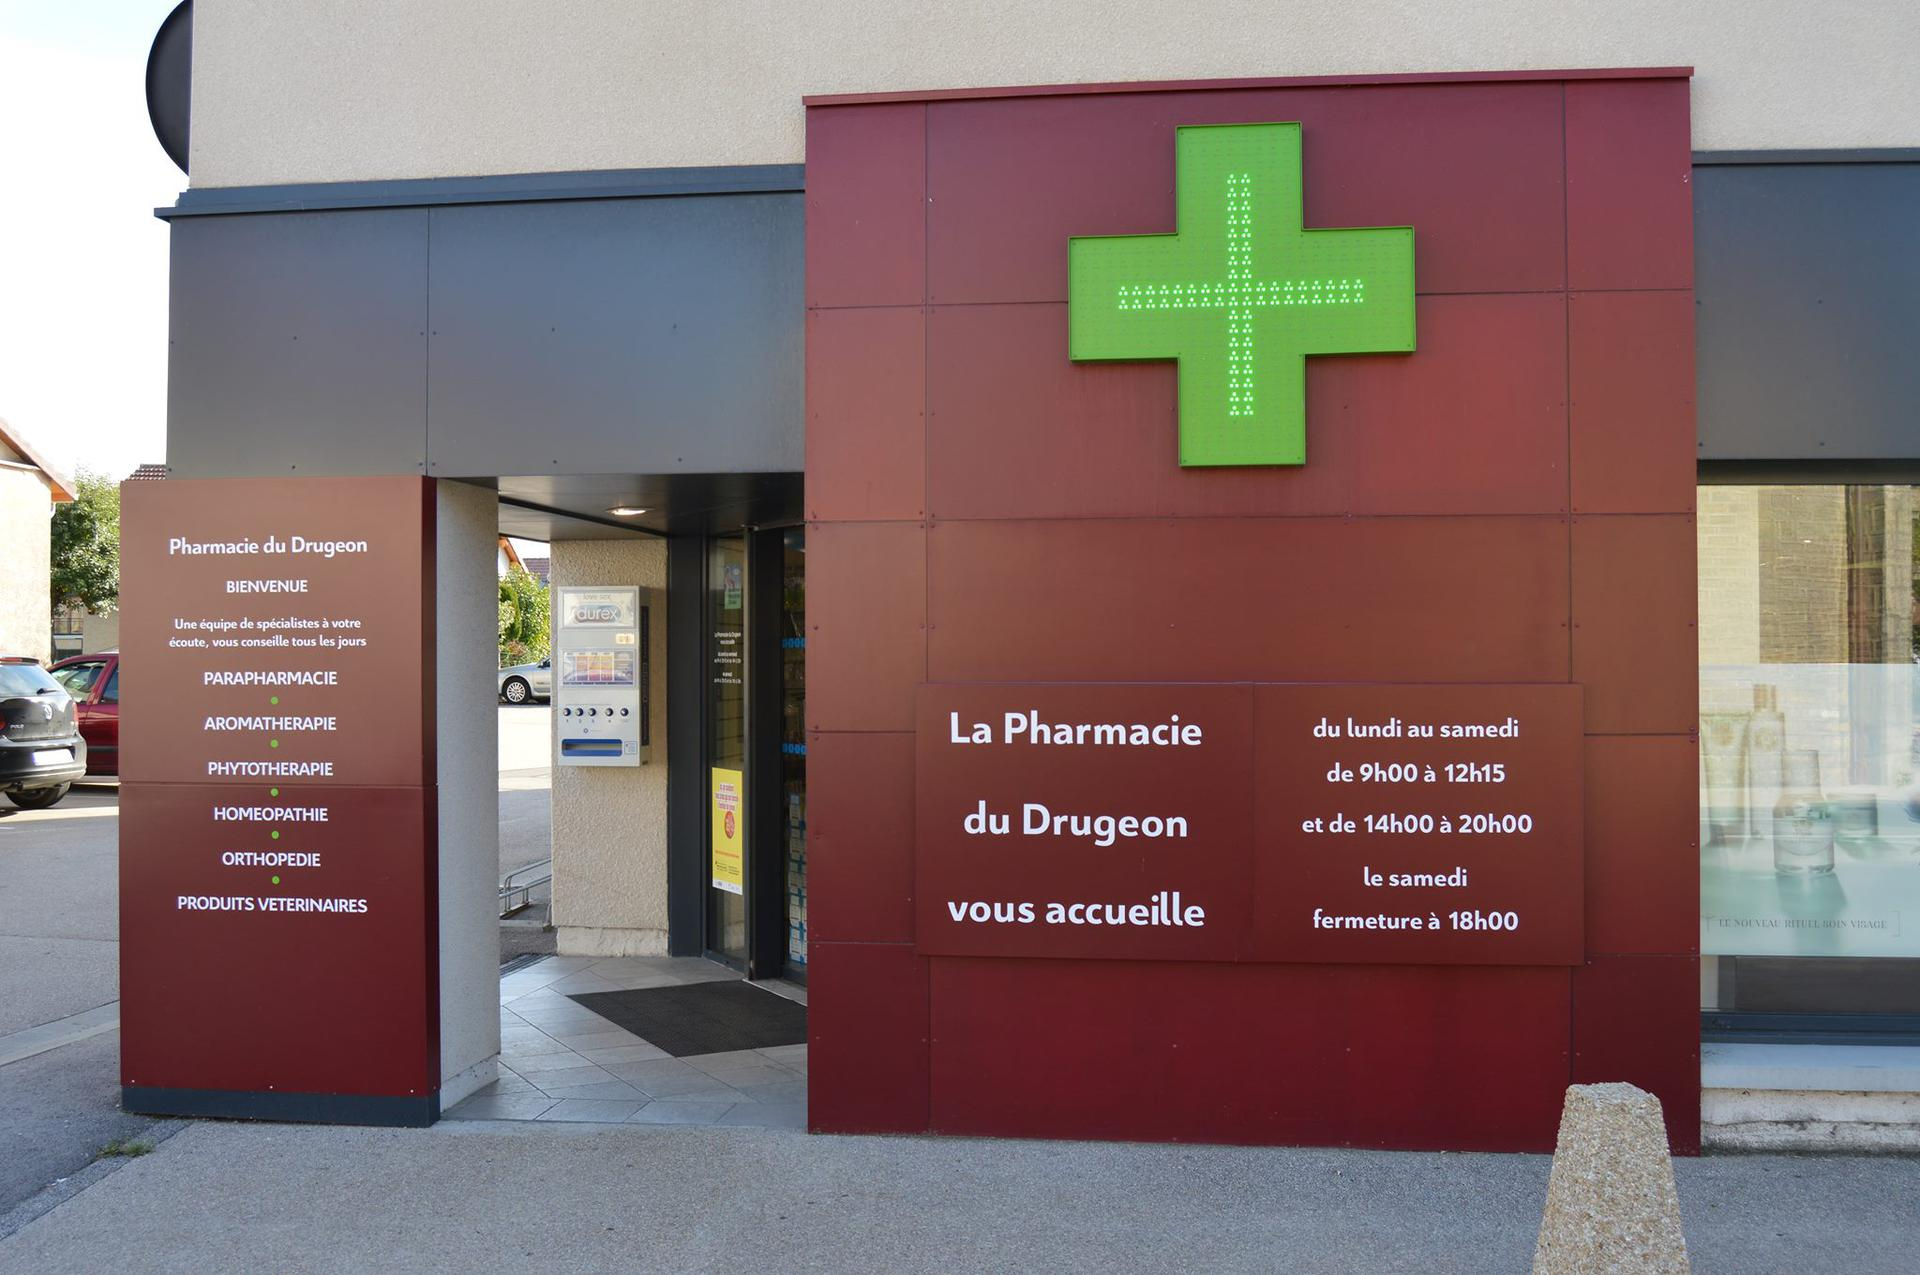 Pharmacie Du Drugeon relaxation